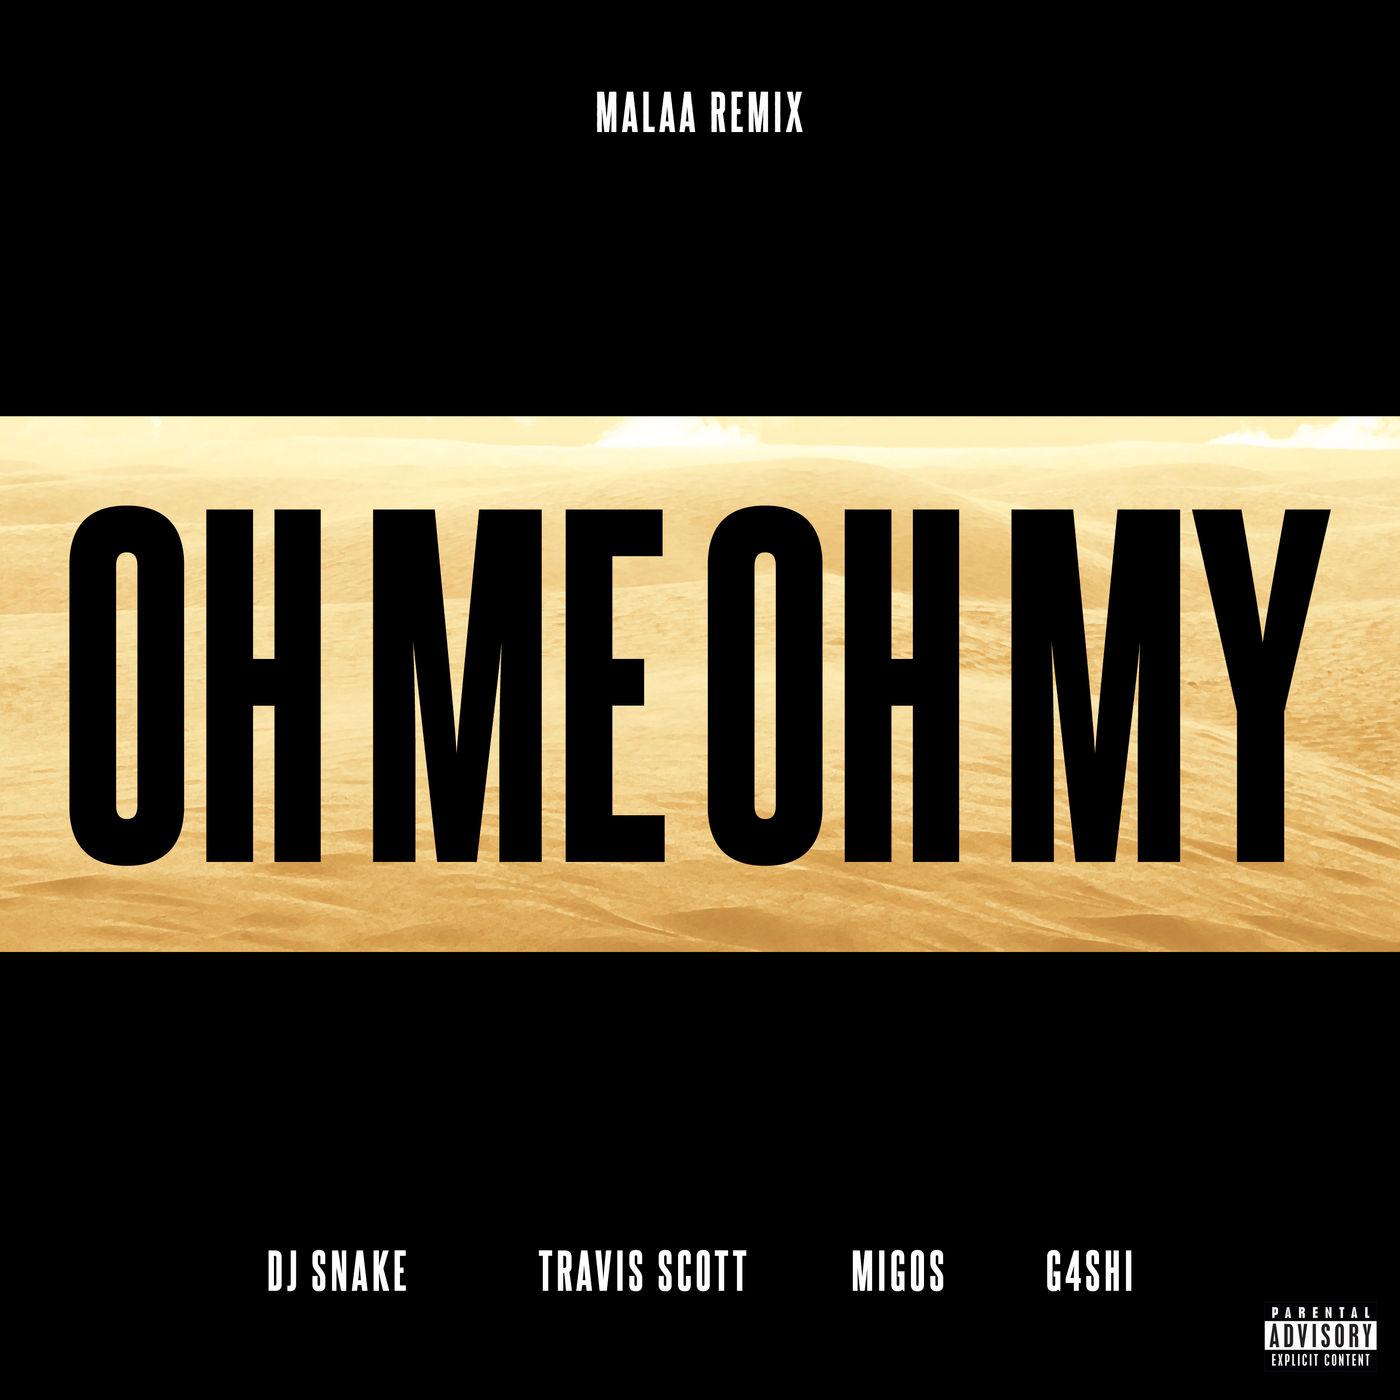 DJ Snake - Oh Me Oh My (Malaa Remix) [feat. Travis Scott, Migos & G4shi] - Single Cover